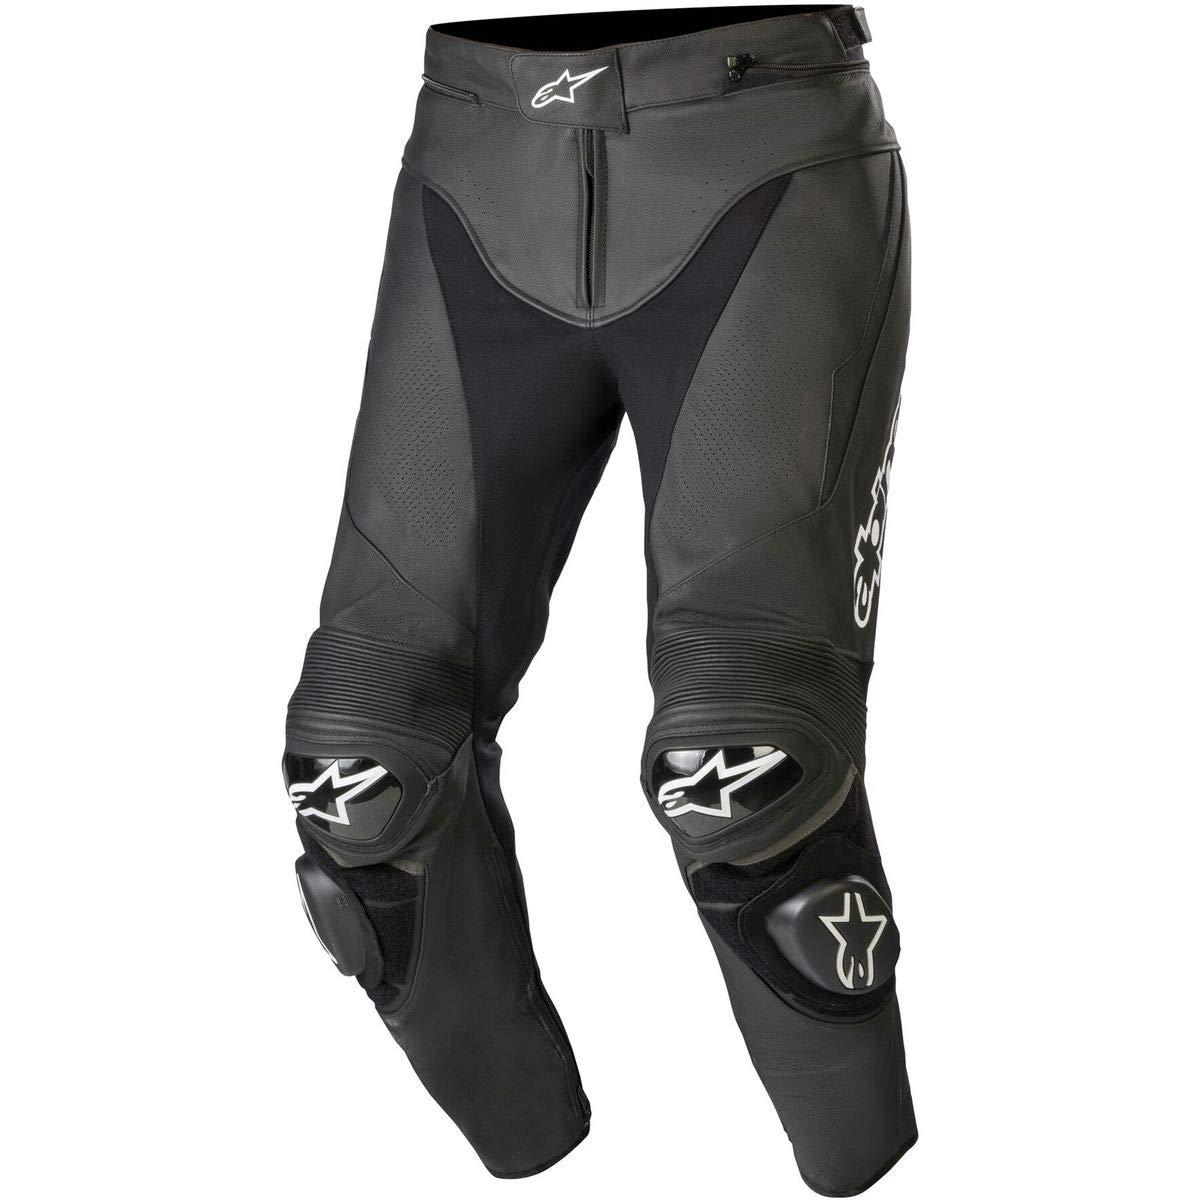 Amazon.com: Alpinestars Misiles piel Pantalones, Negro ...